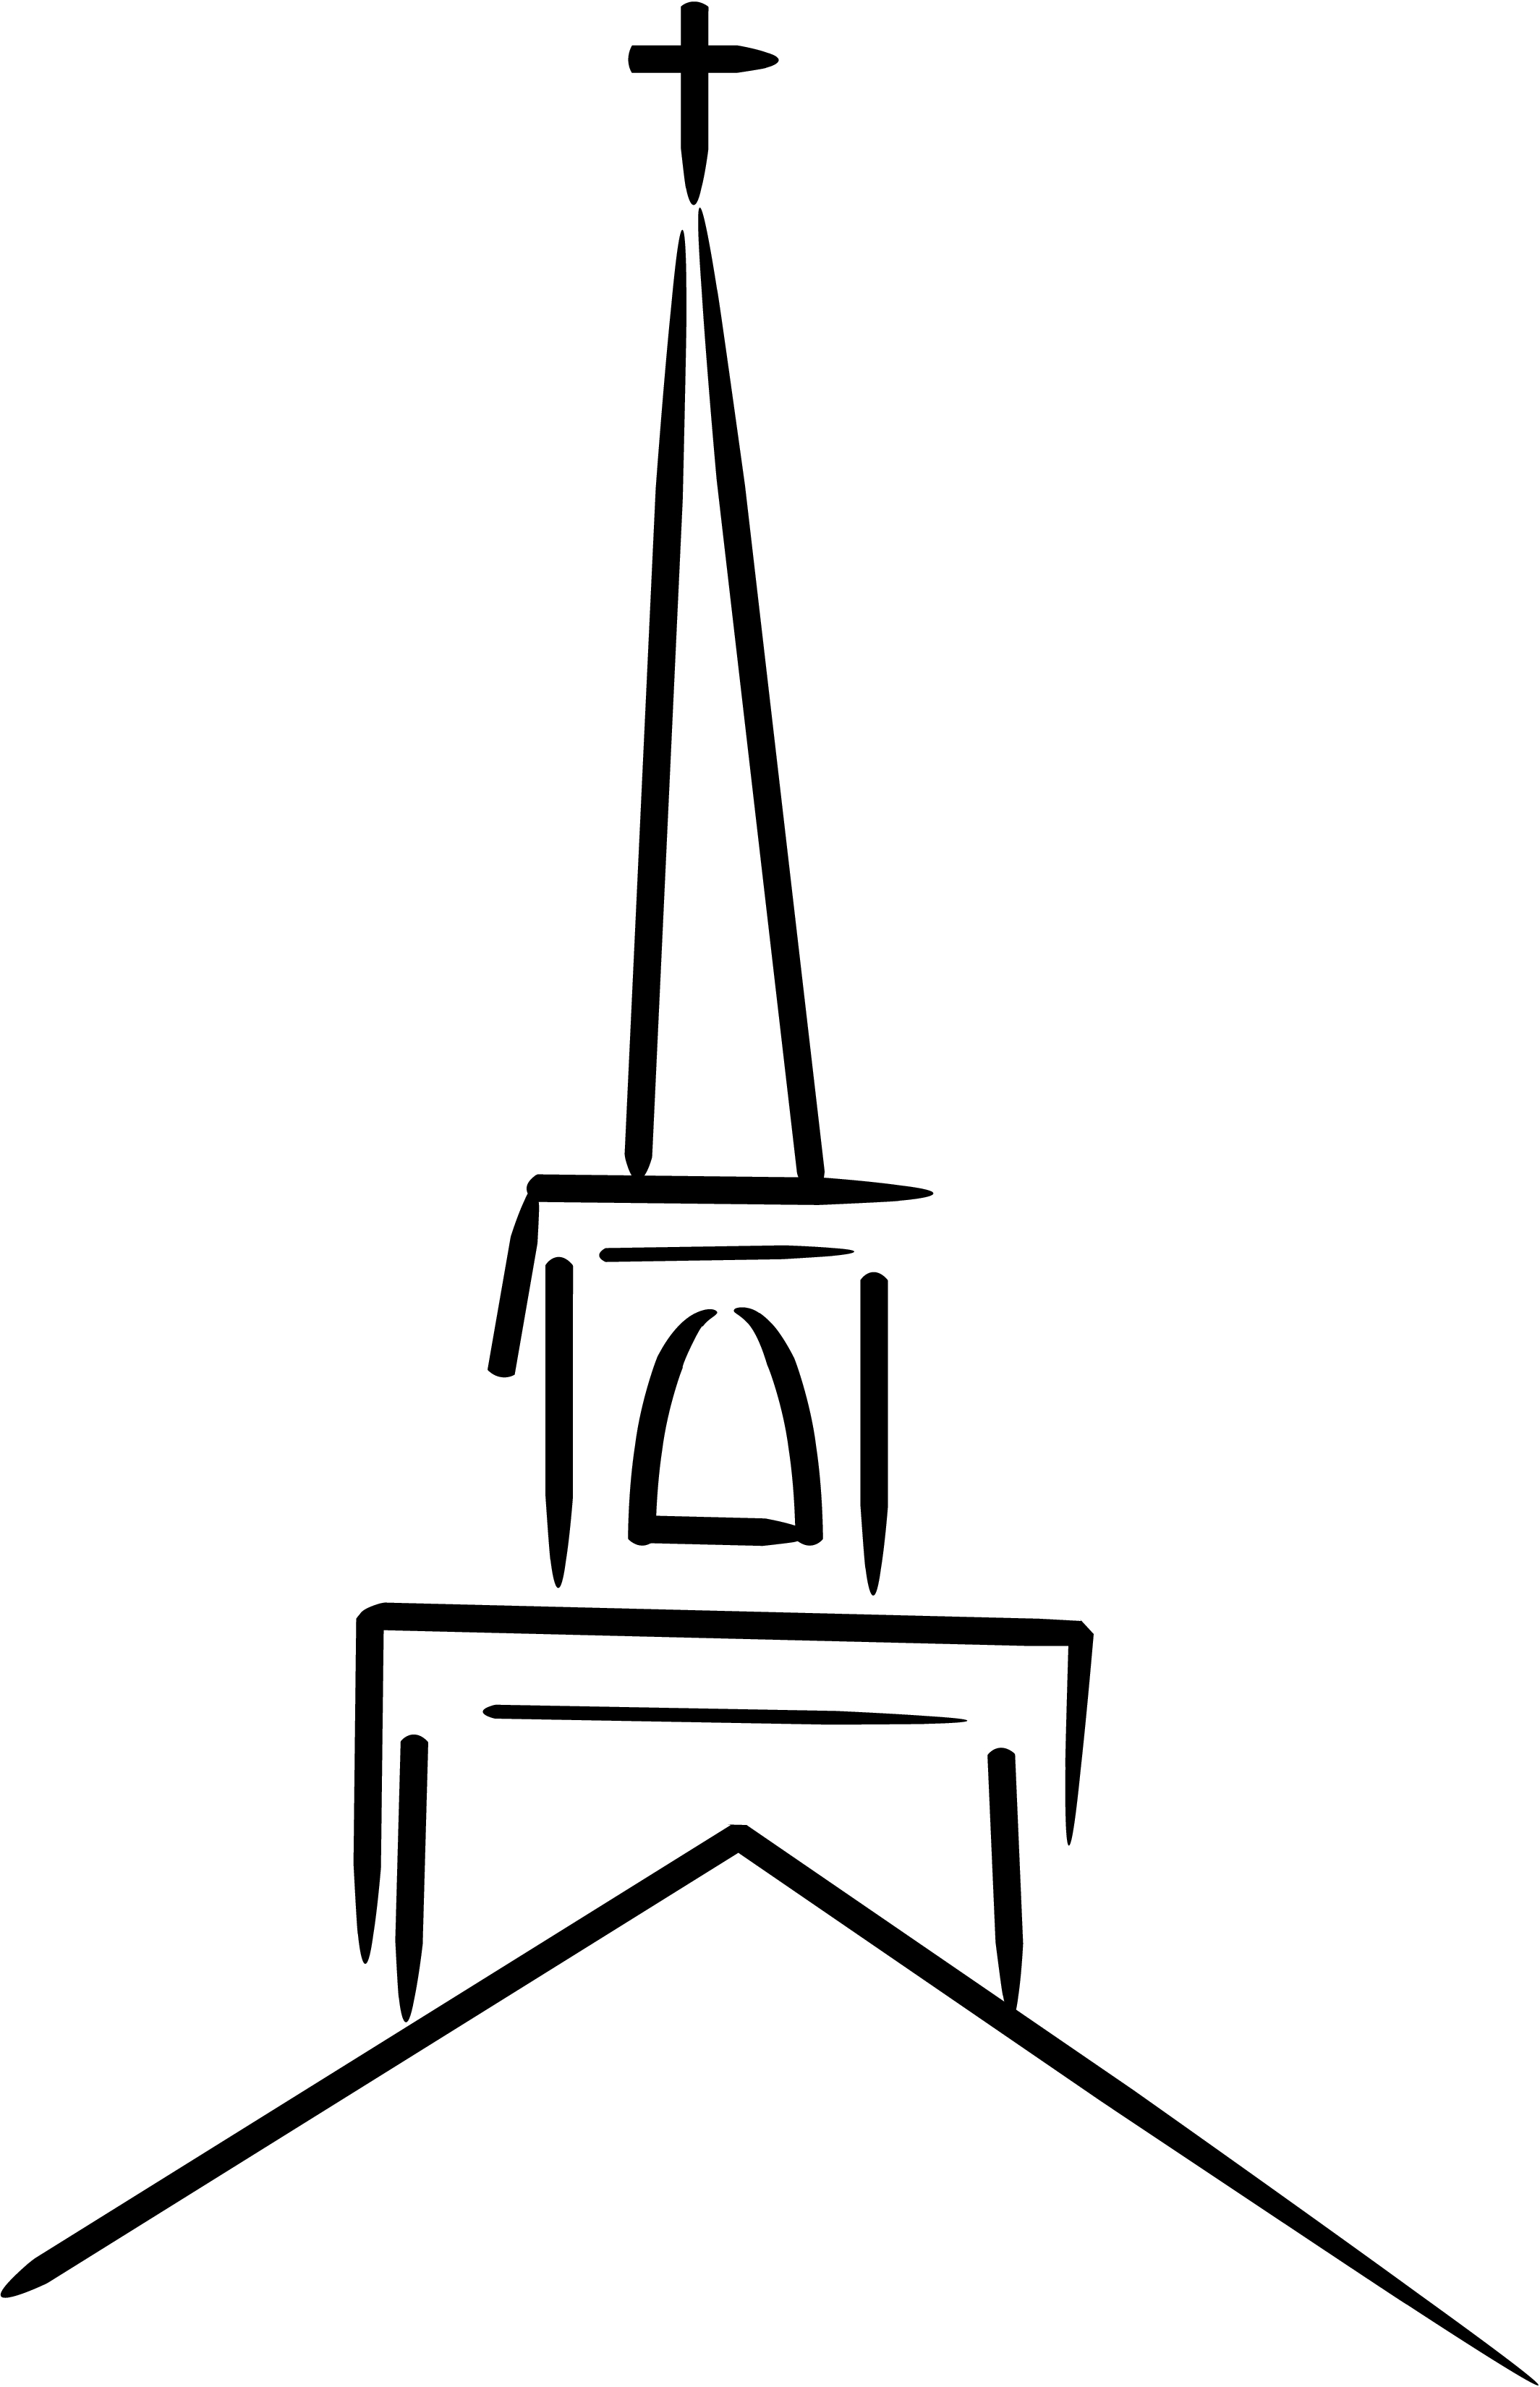 clip art church cross - photo #33